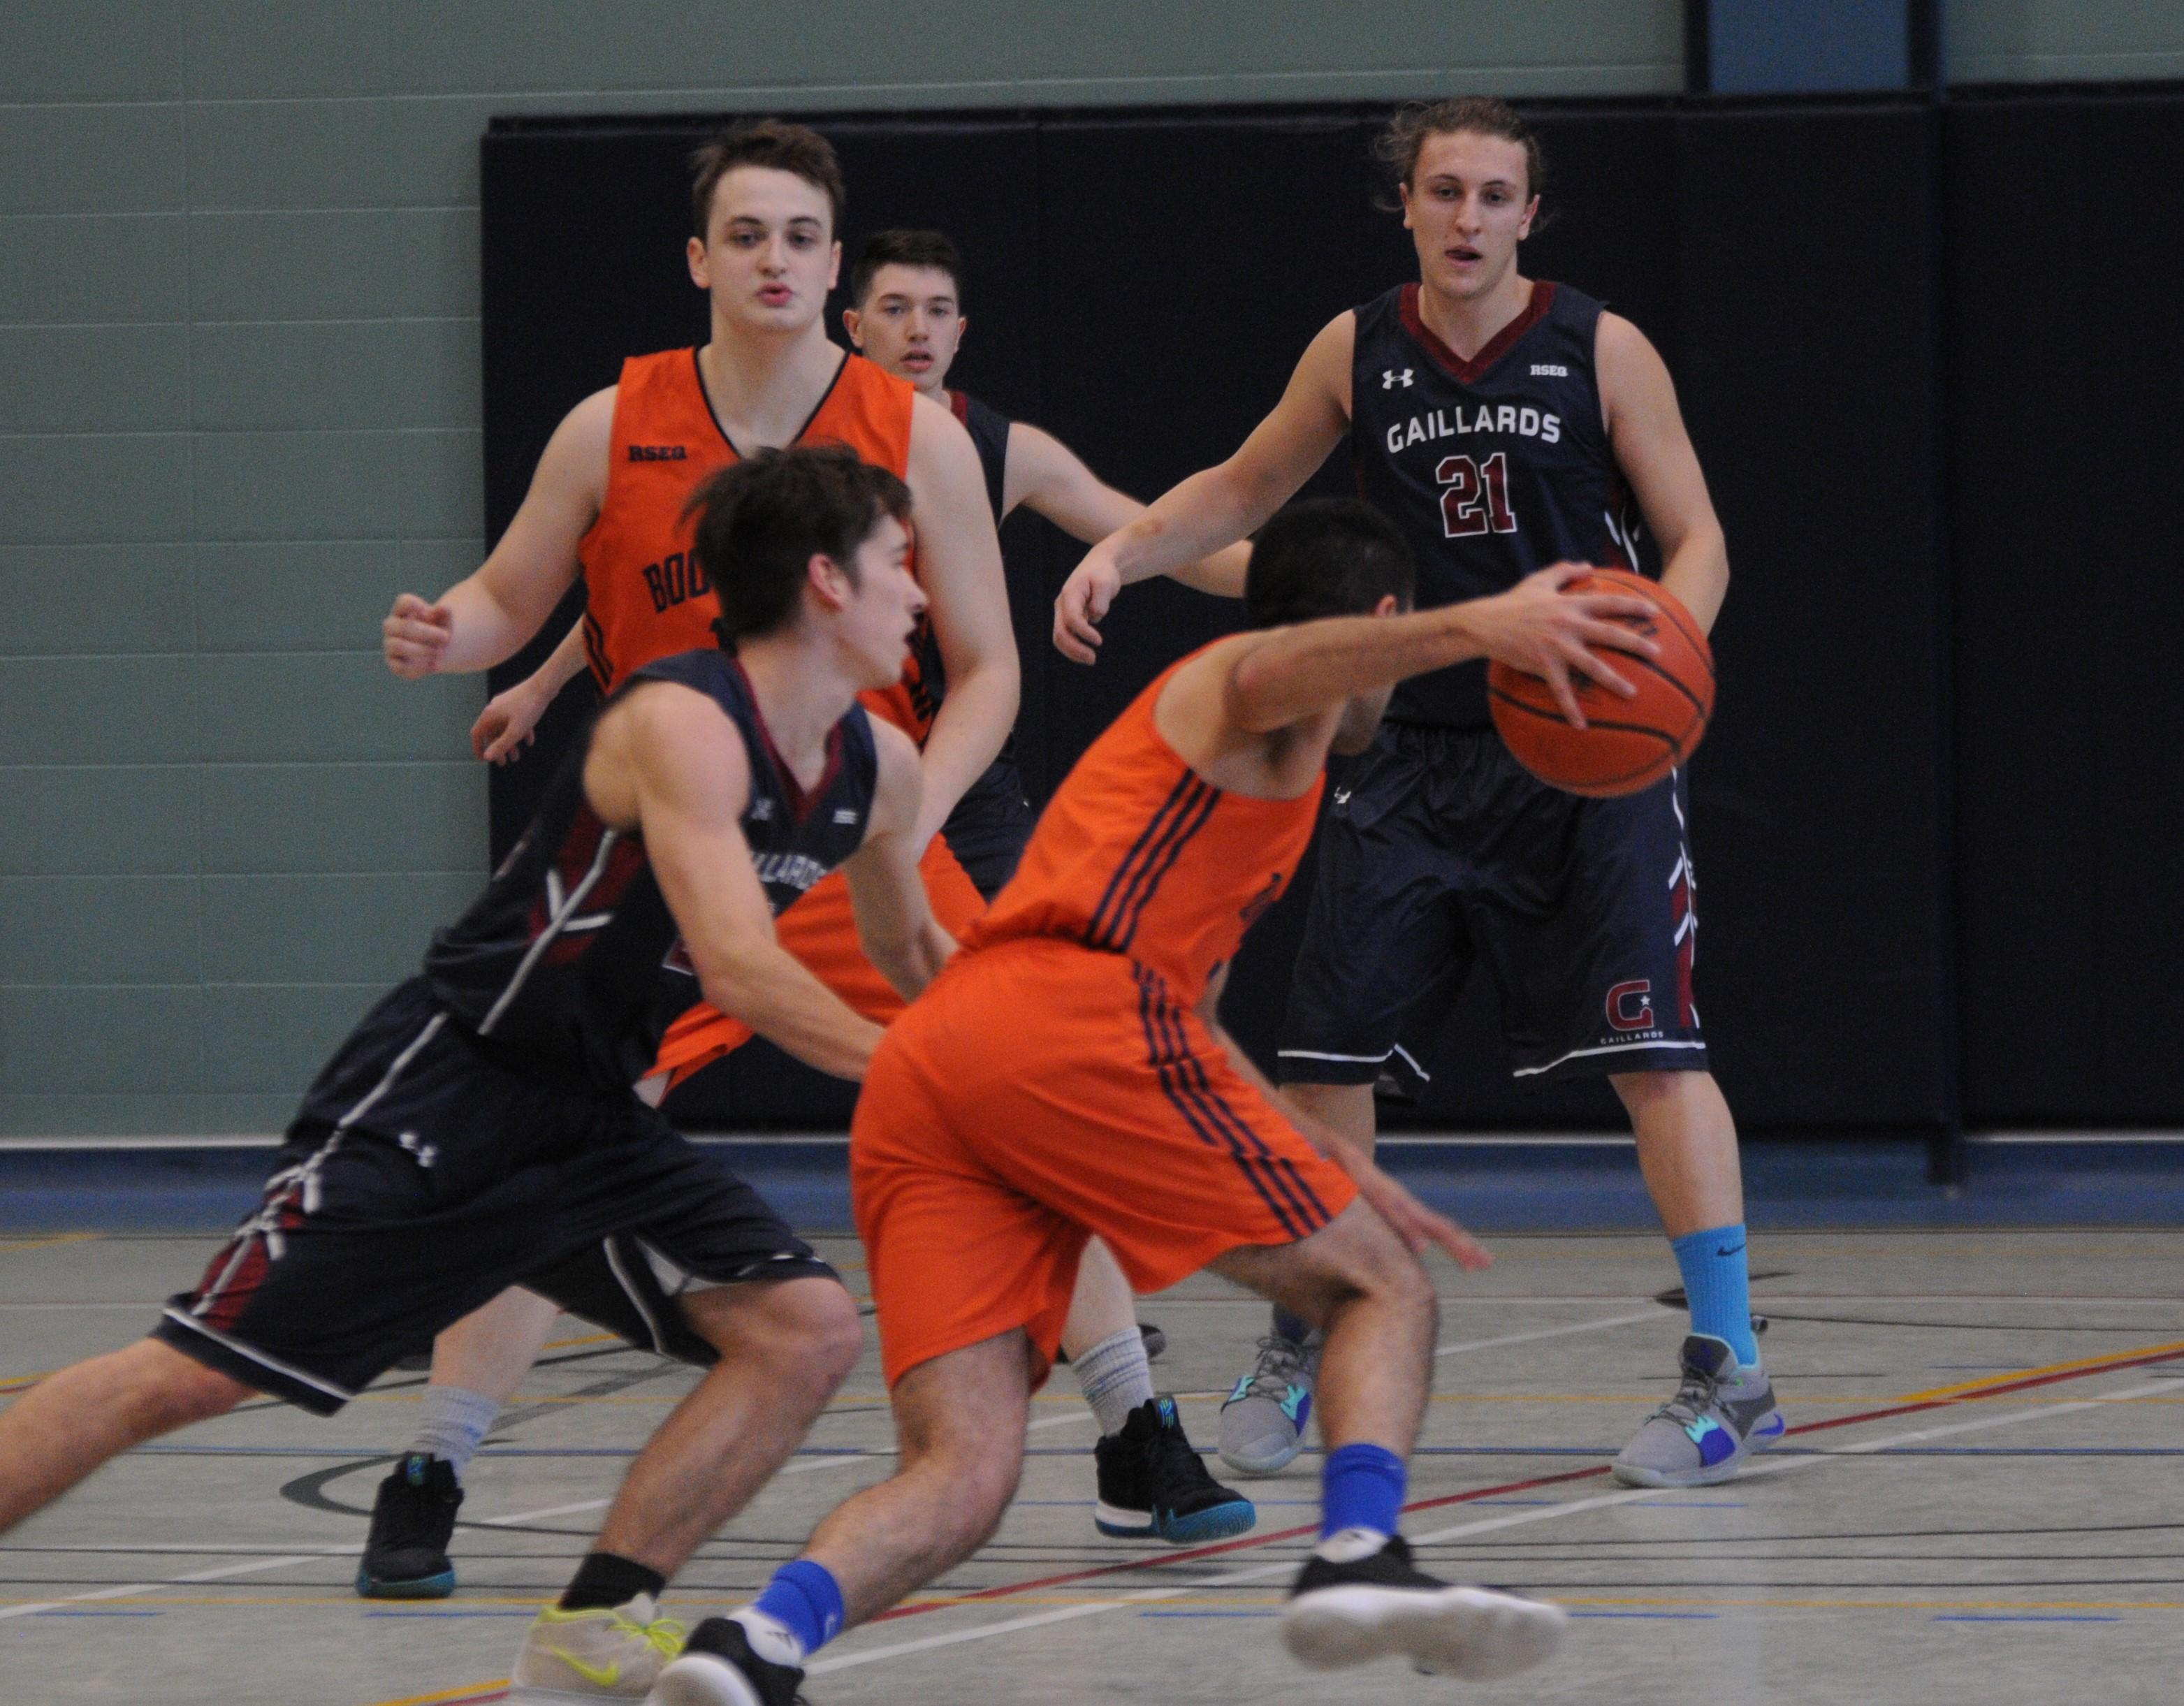 Basketball Gaillards